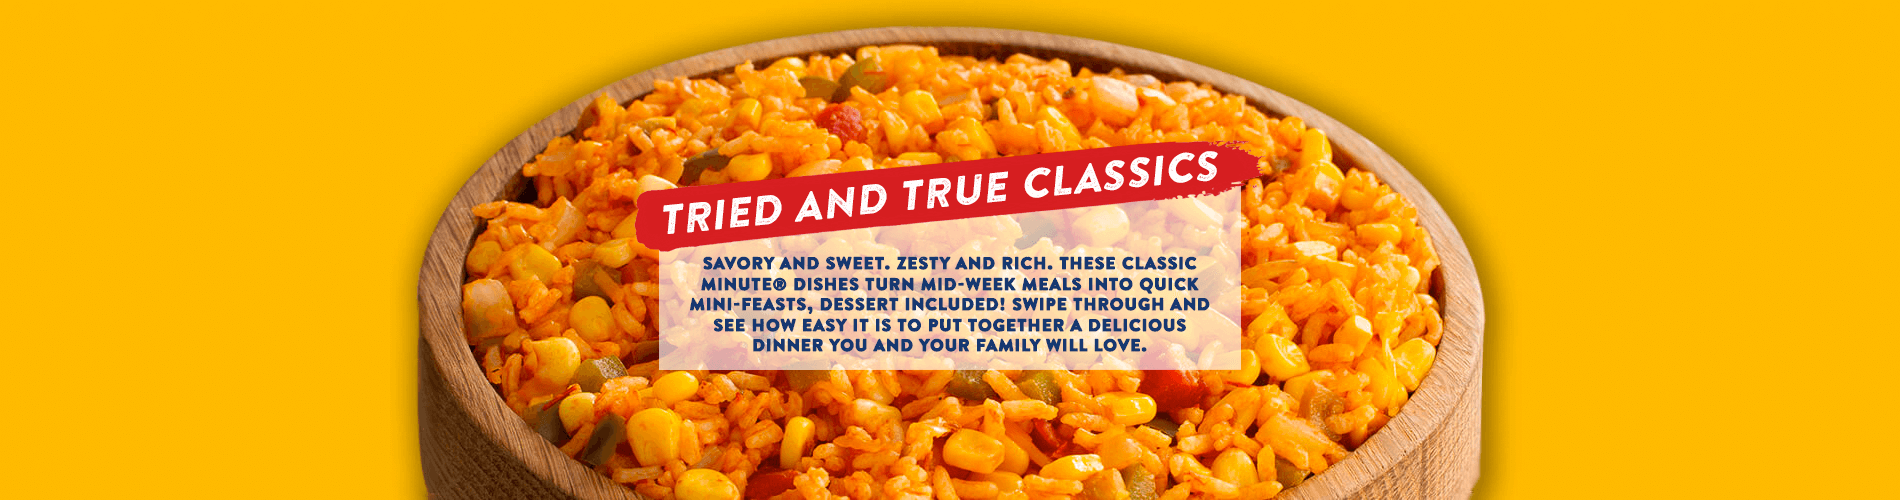 Tried and true classics